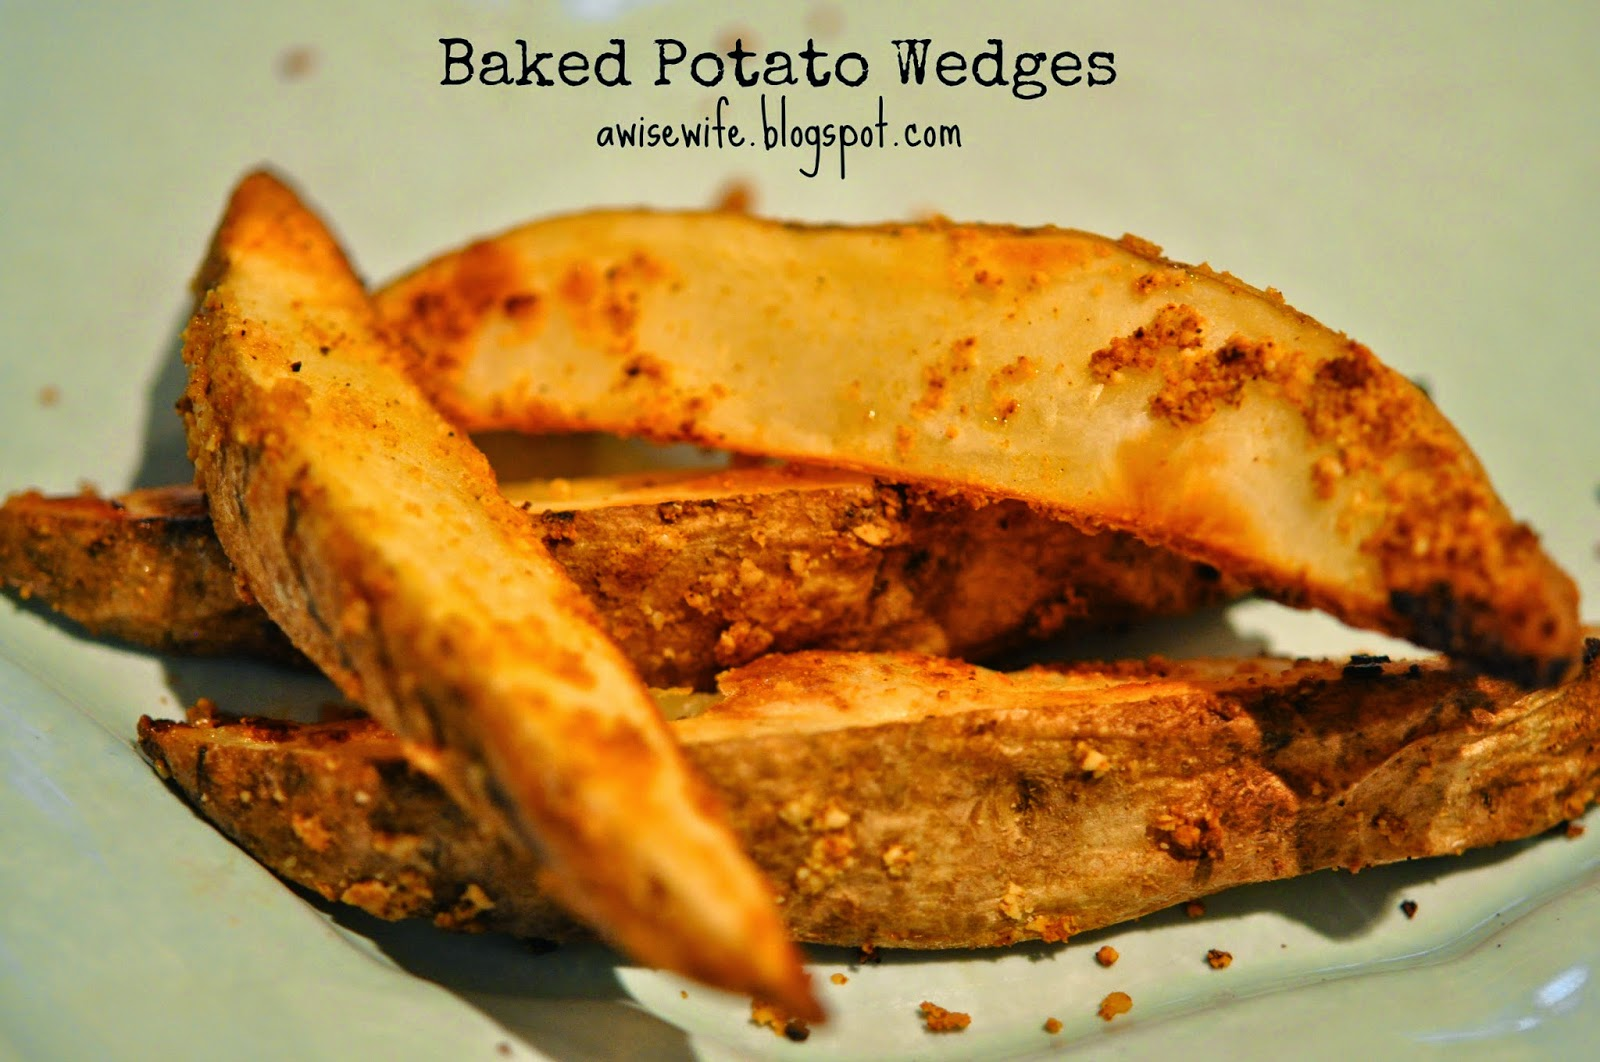 ... potato wedges printable recipe here here baked potato wedges naturally